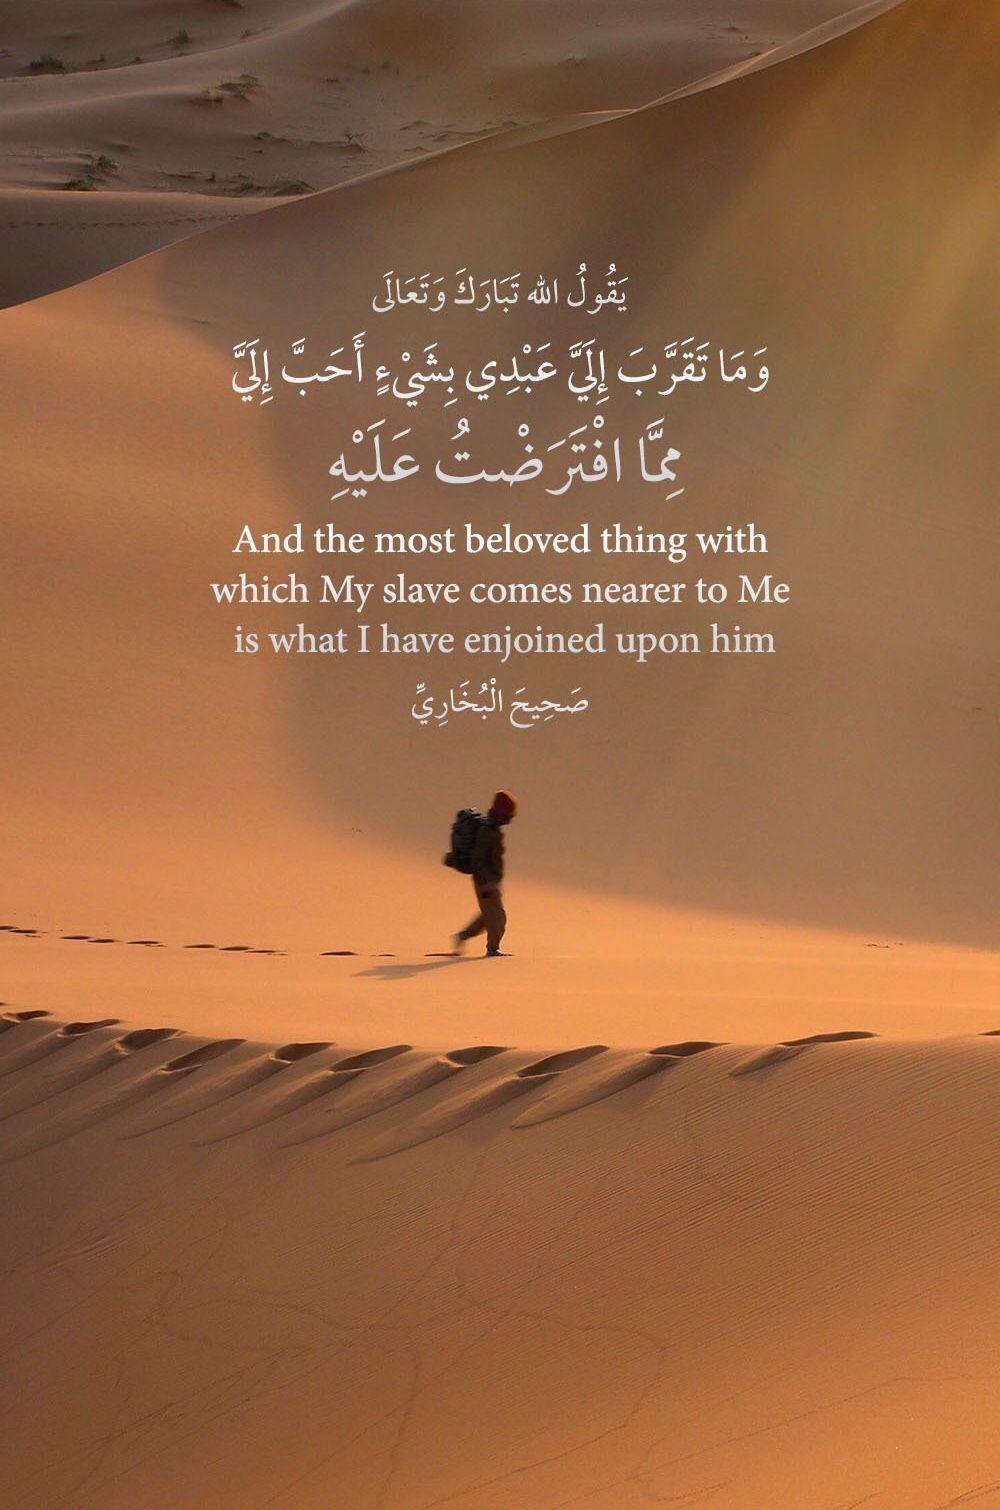 Pin By Fahad Baloch On Quran Verses Islamic Quotes Quran Verses Islamic Quotes Quran Islamic Quotes